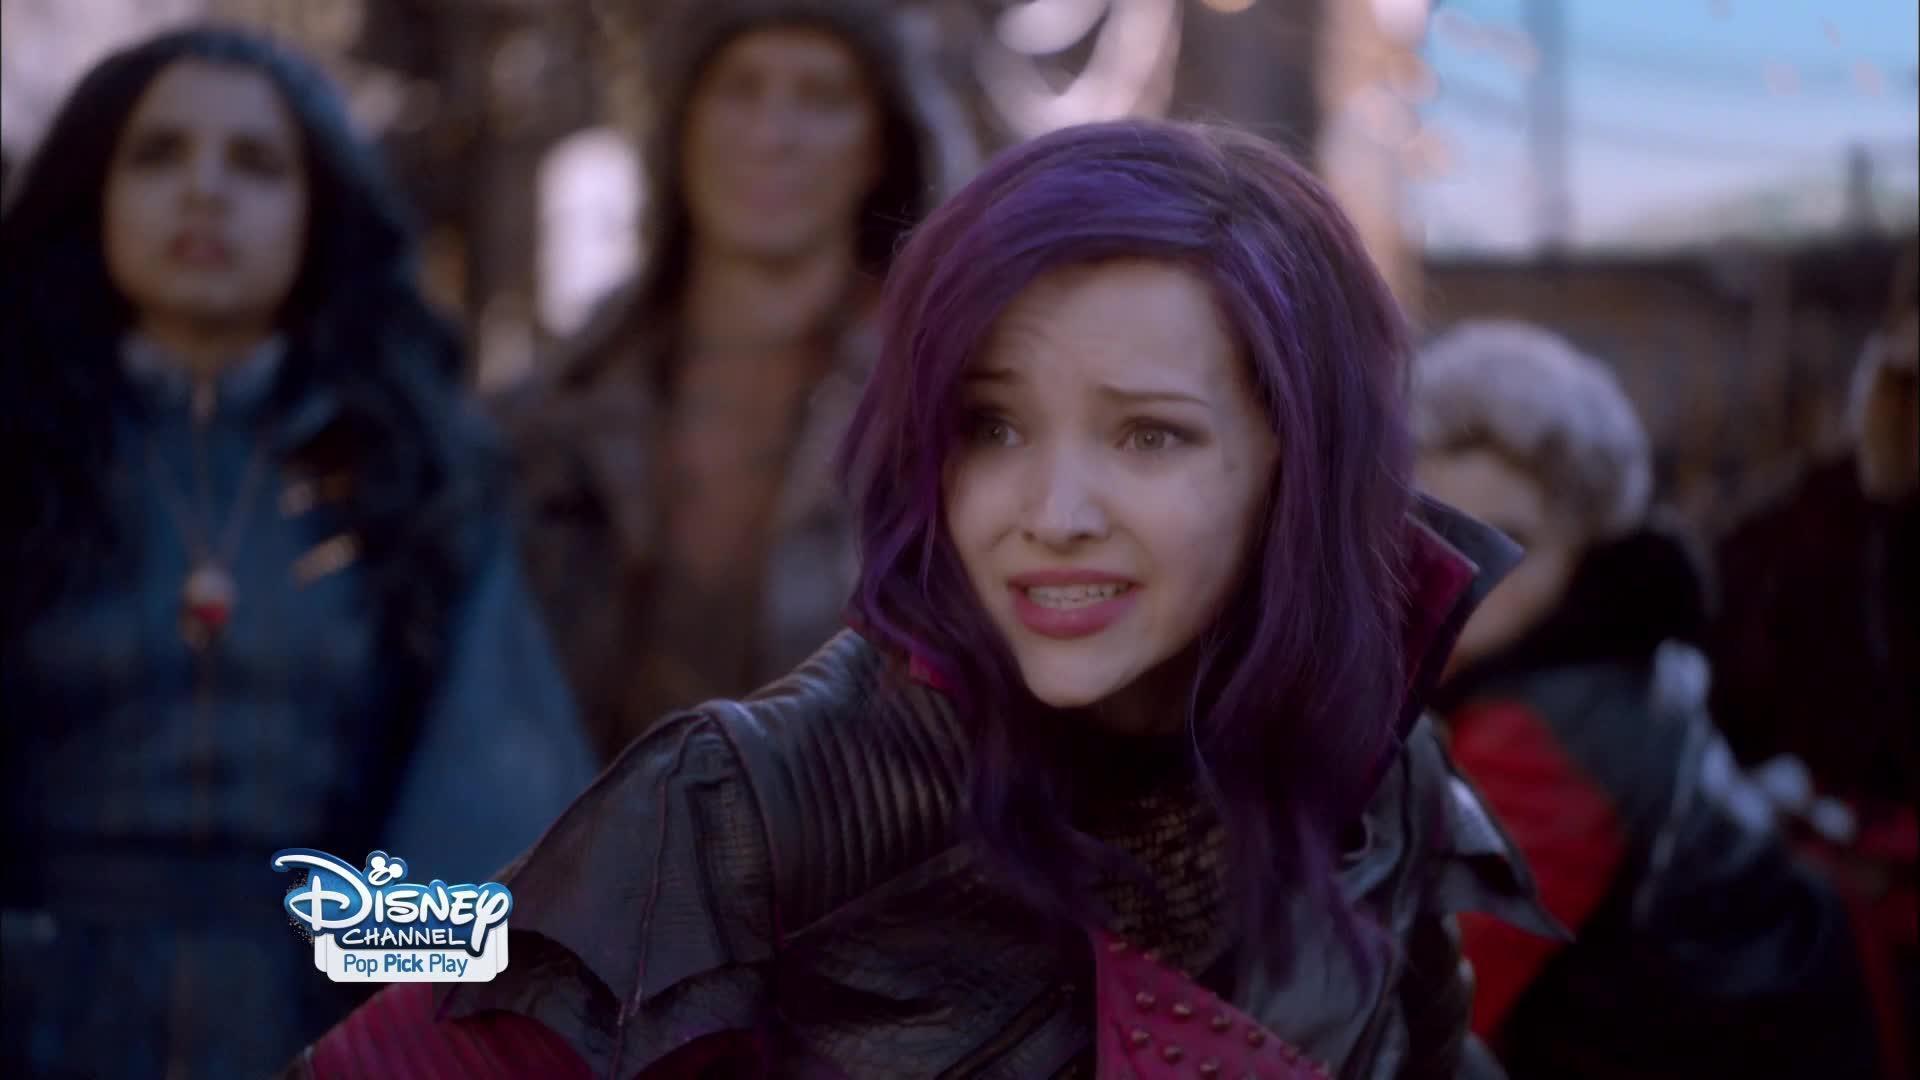 Disney Channel Pop Pick Play - Les méchants